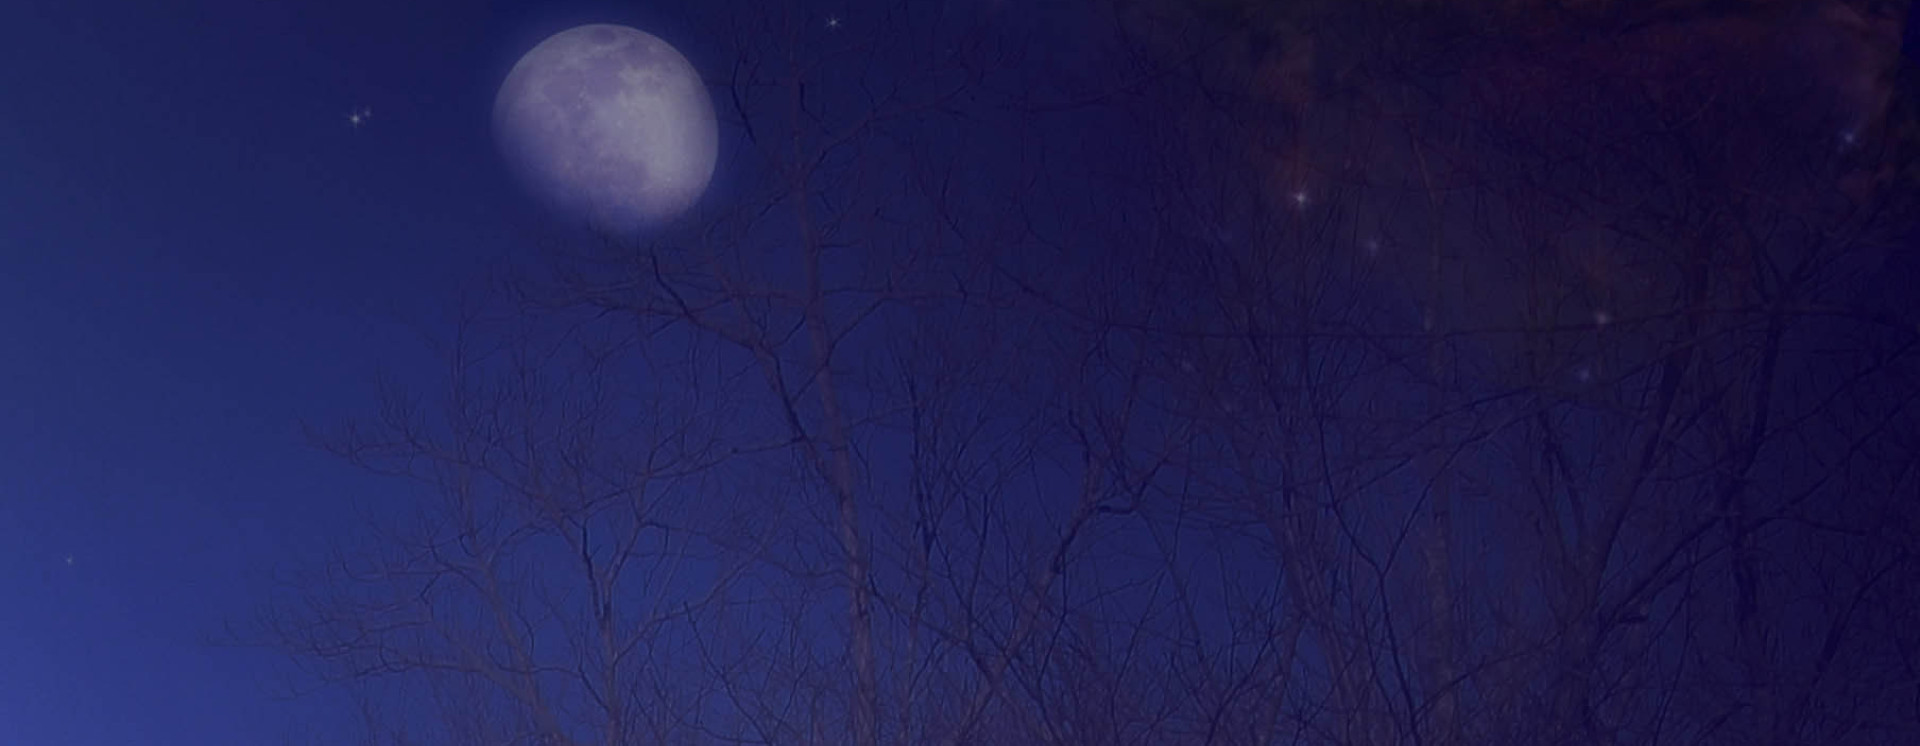 1391575274 art ificial night copy